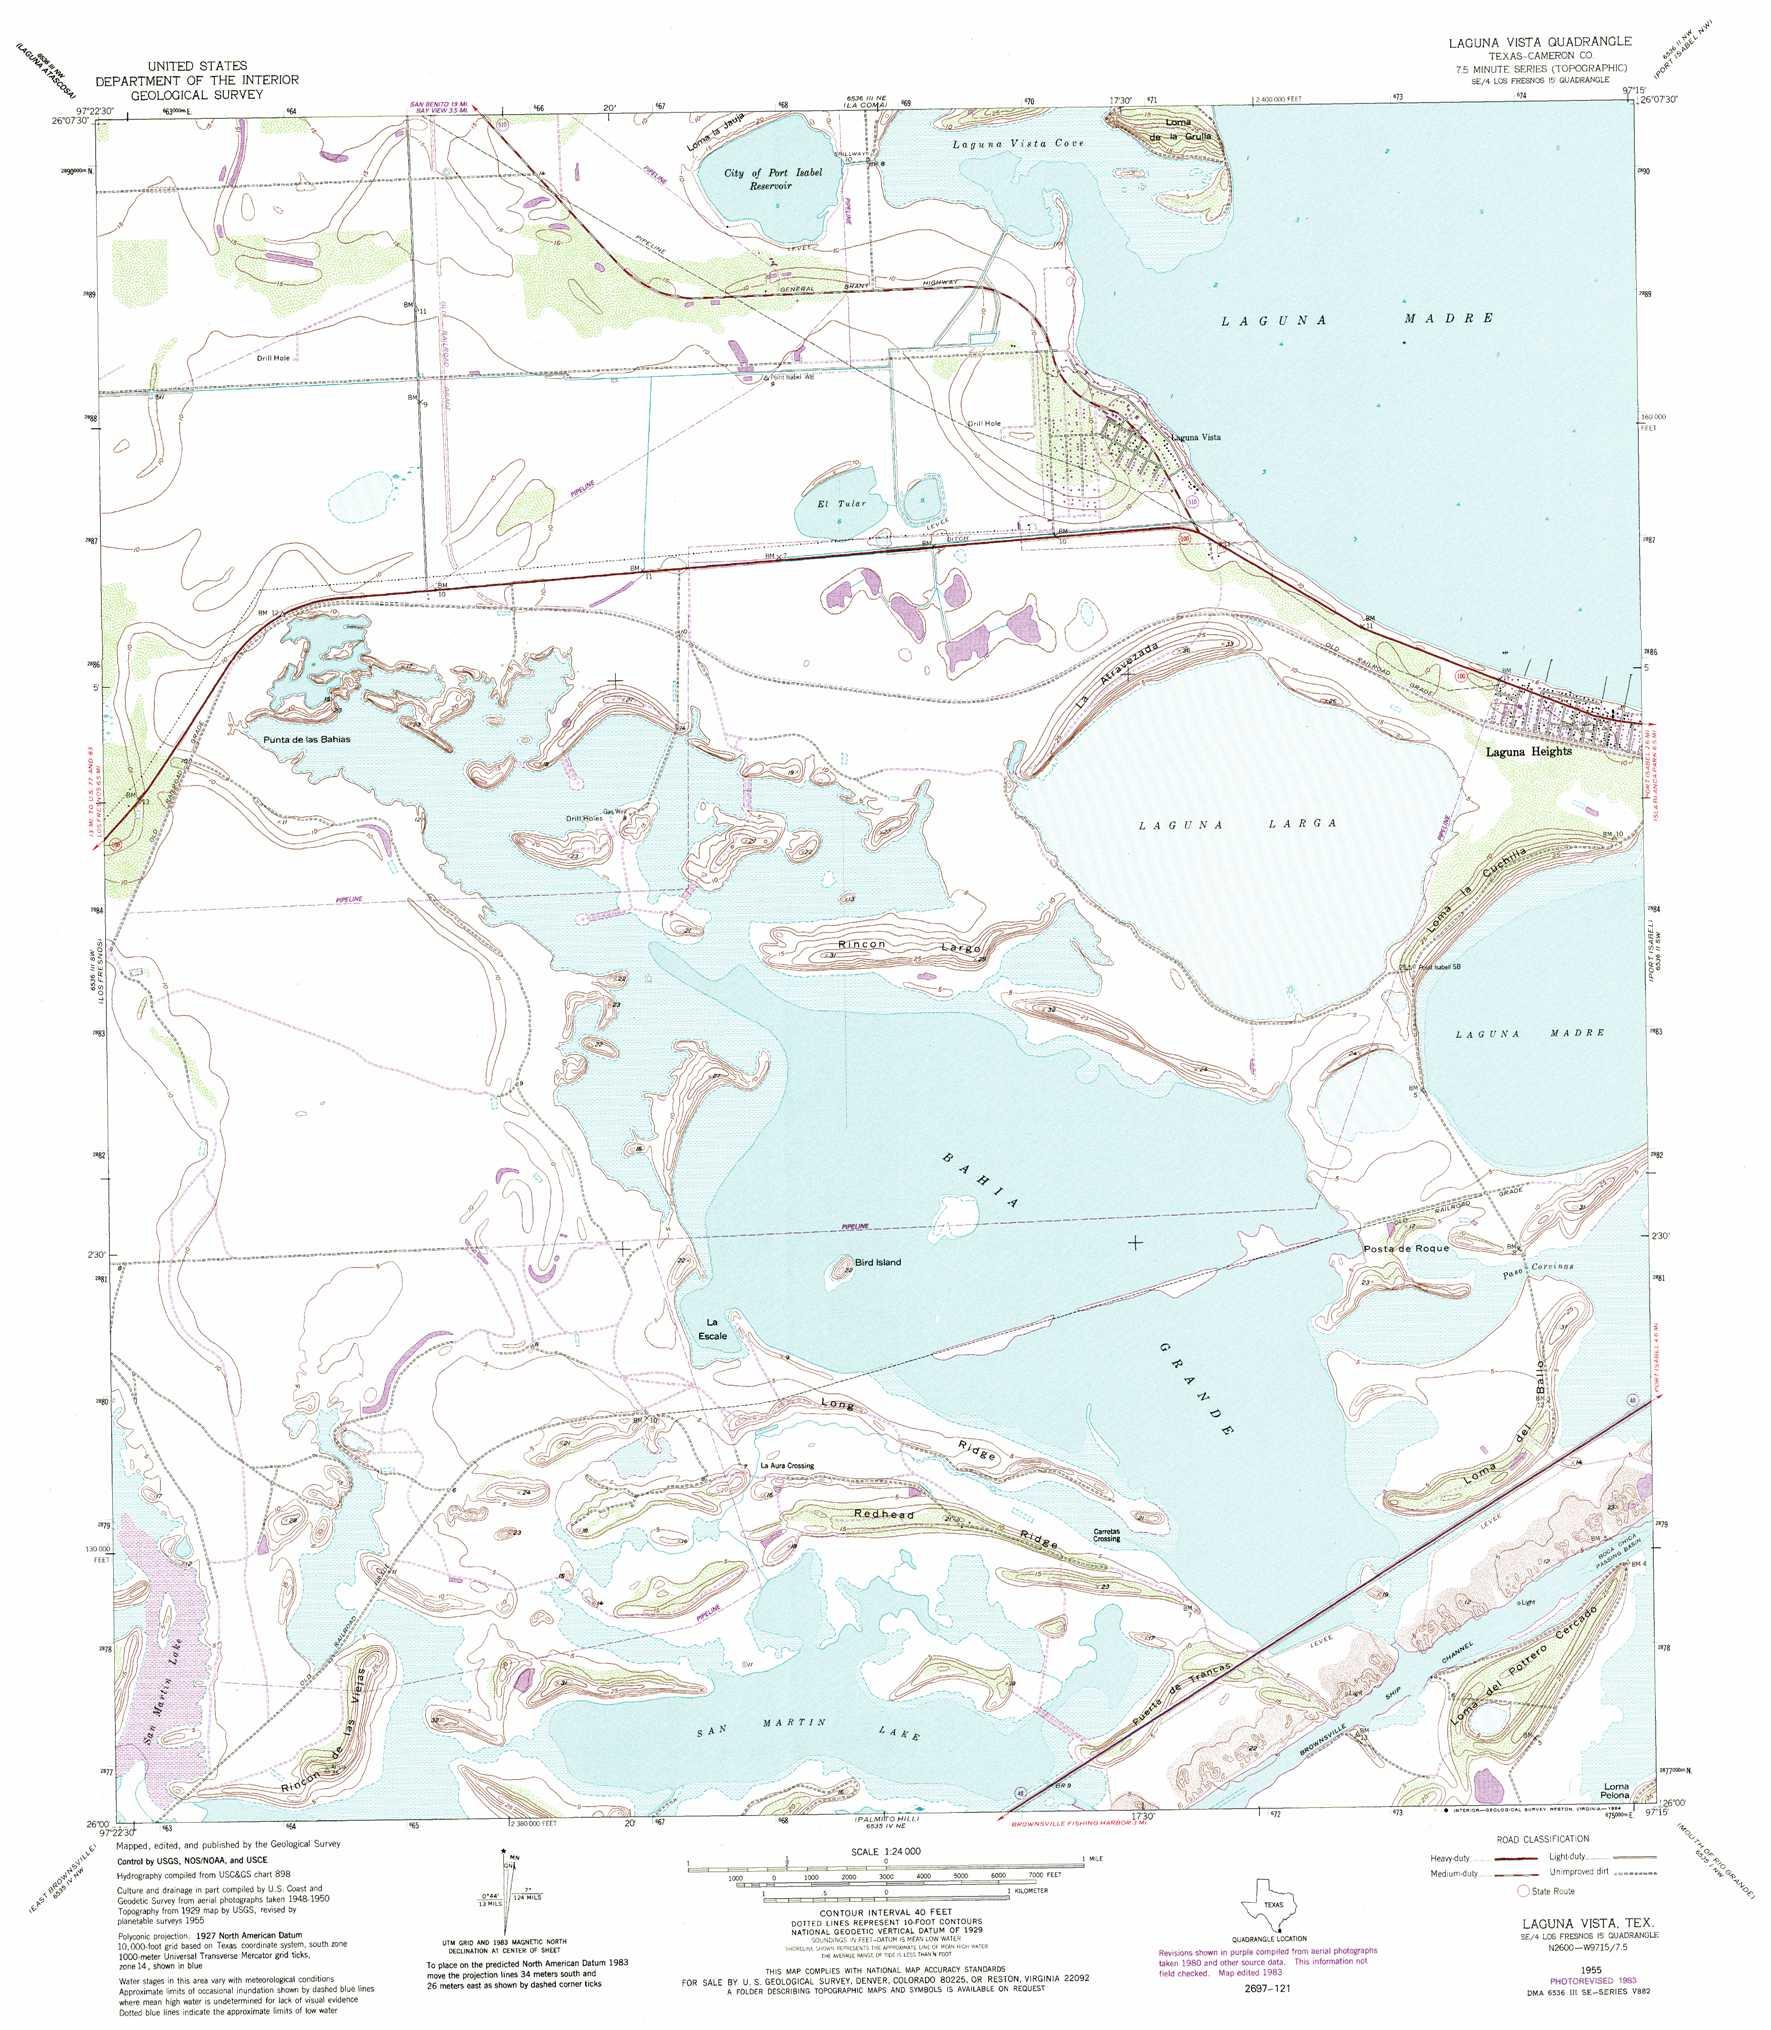 Laguna Vista topographic map, TX - USGS Topo Quad 26097a3 on map of la vernia tx, map of ingleside tx, map of pleasanton tx, map of st hedwig tx, map of george west tx, map of lufkin tx, map of la feria tx, map of raymondville tx, map of gun barrel city tx, map of humble tx, map of camp wood tx, map of uvalde tx, map of rio grande city tx, map of leakey tx, map of groves tx, map of katy tx, map of rocksprings tx, map of henderson tx, map of harlingen tx, map of lindale tx,